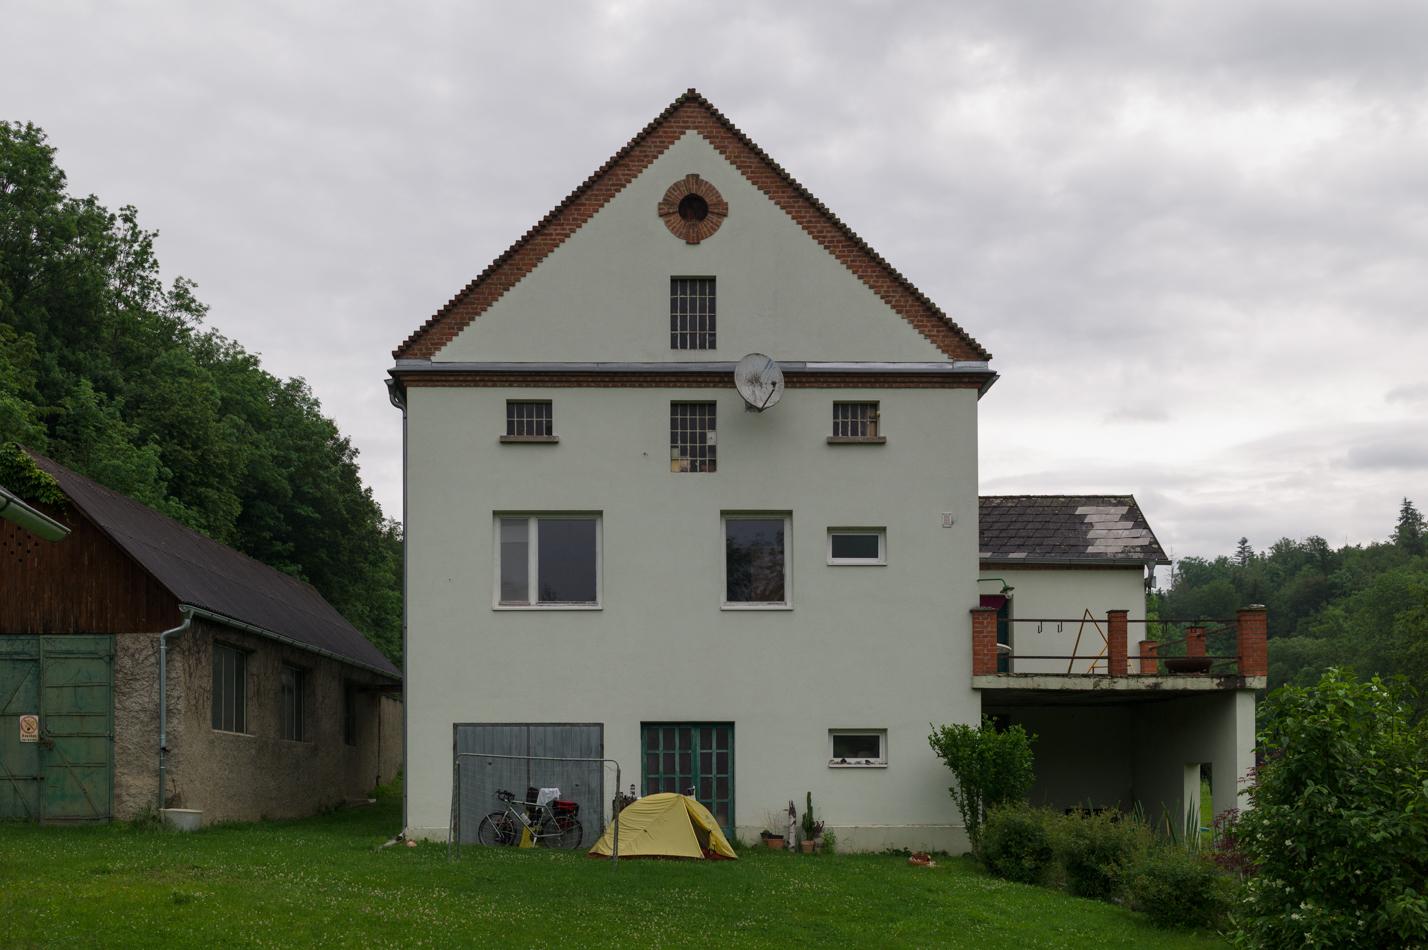 Country house near Gobelin, June 9th